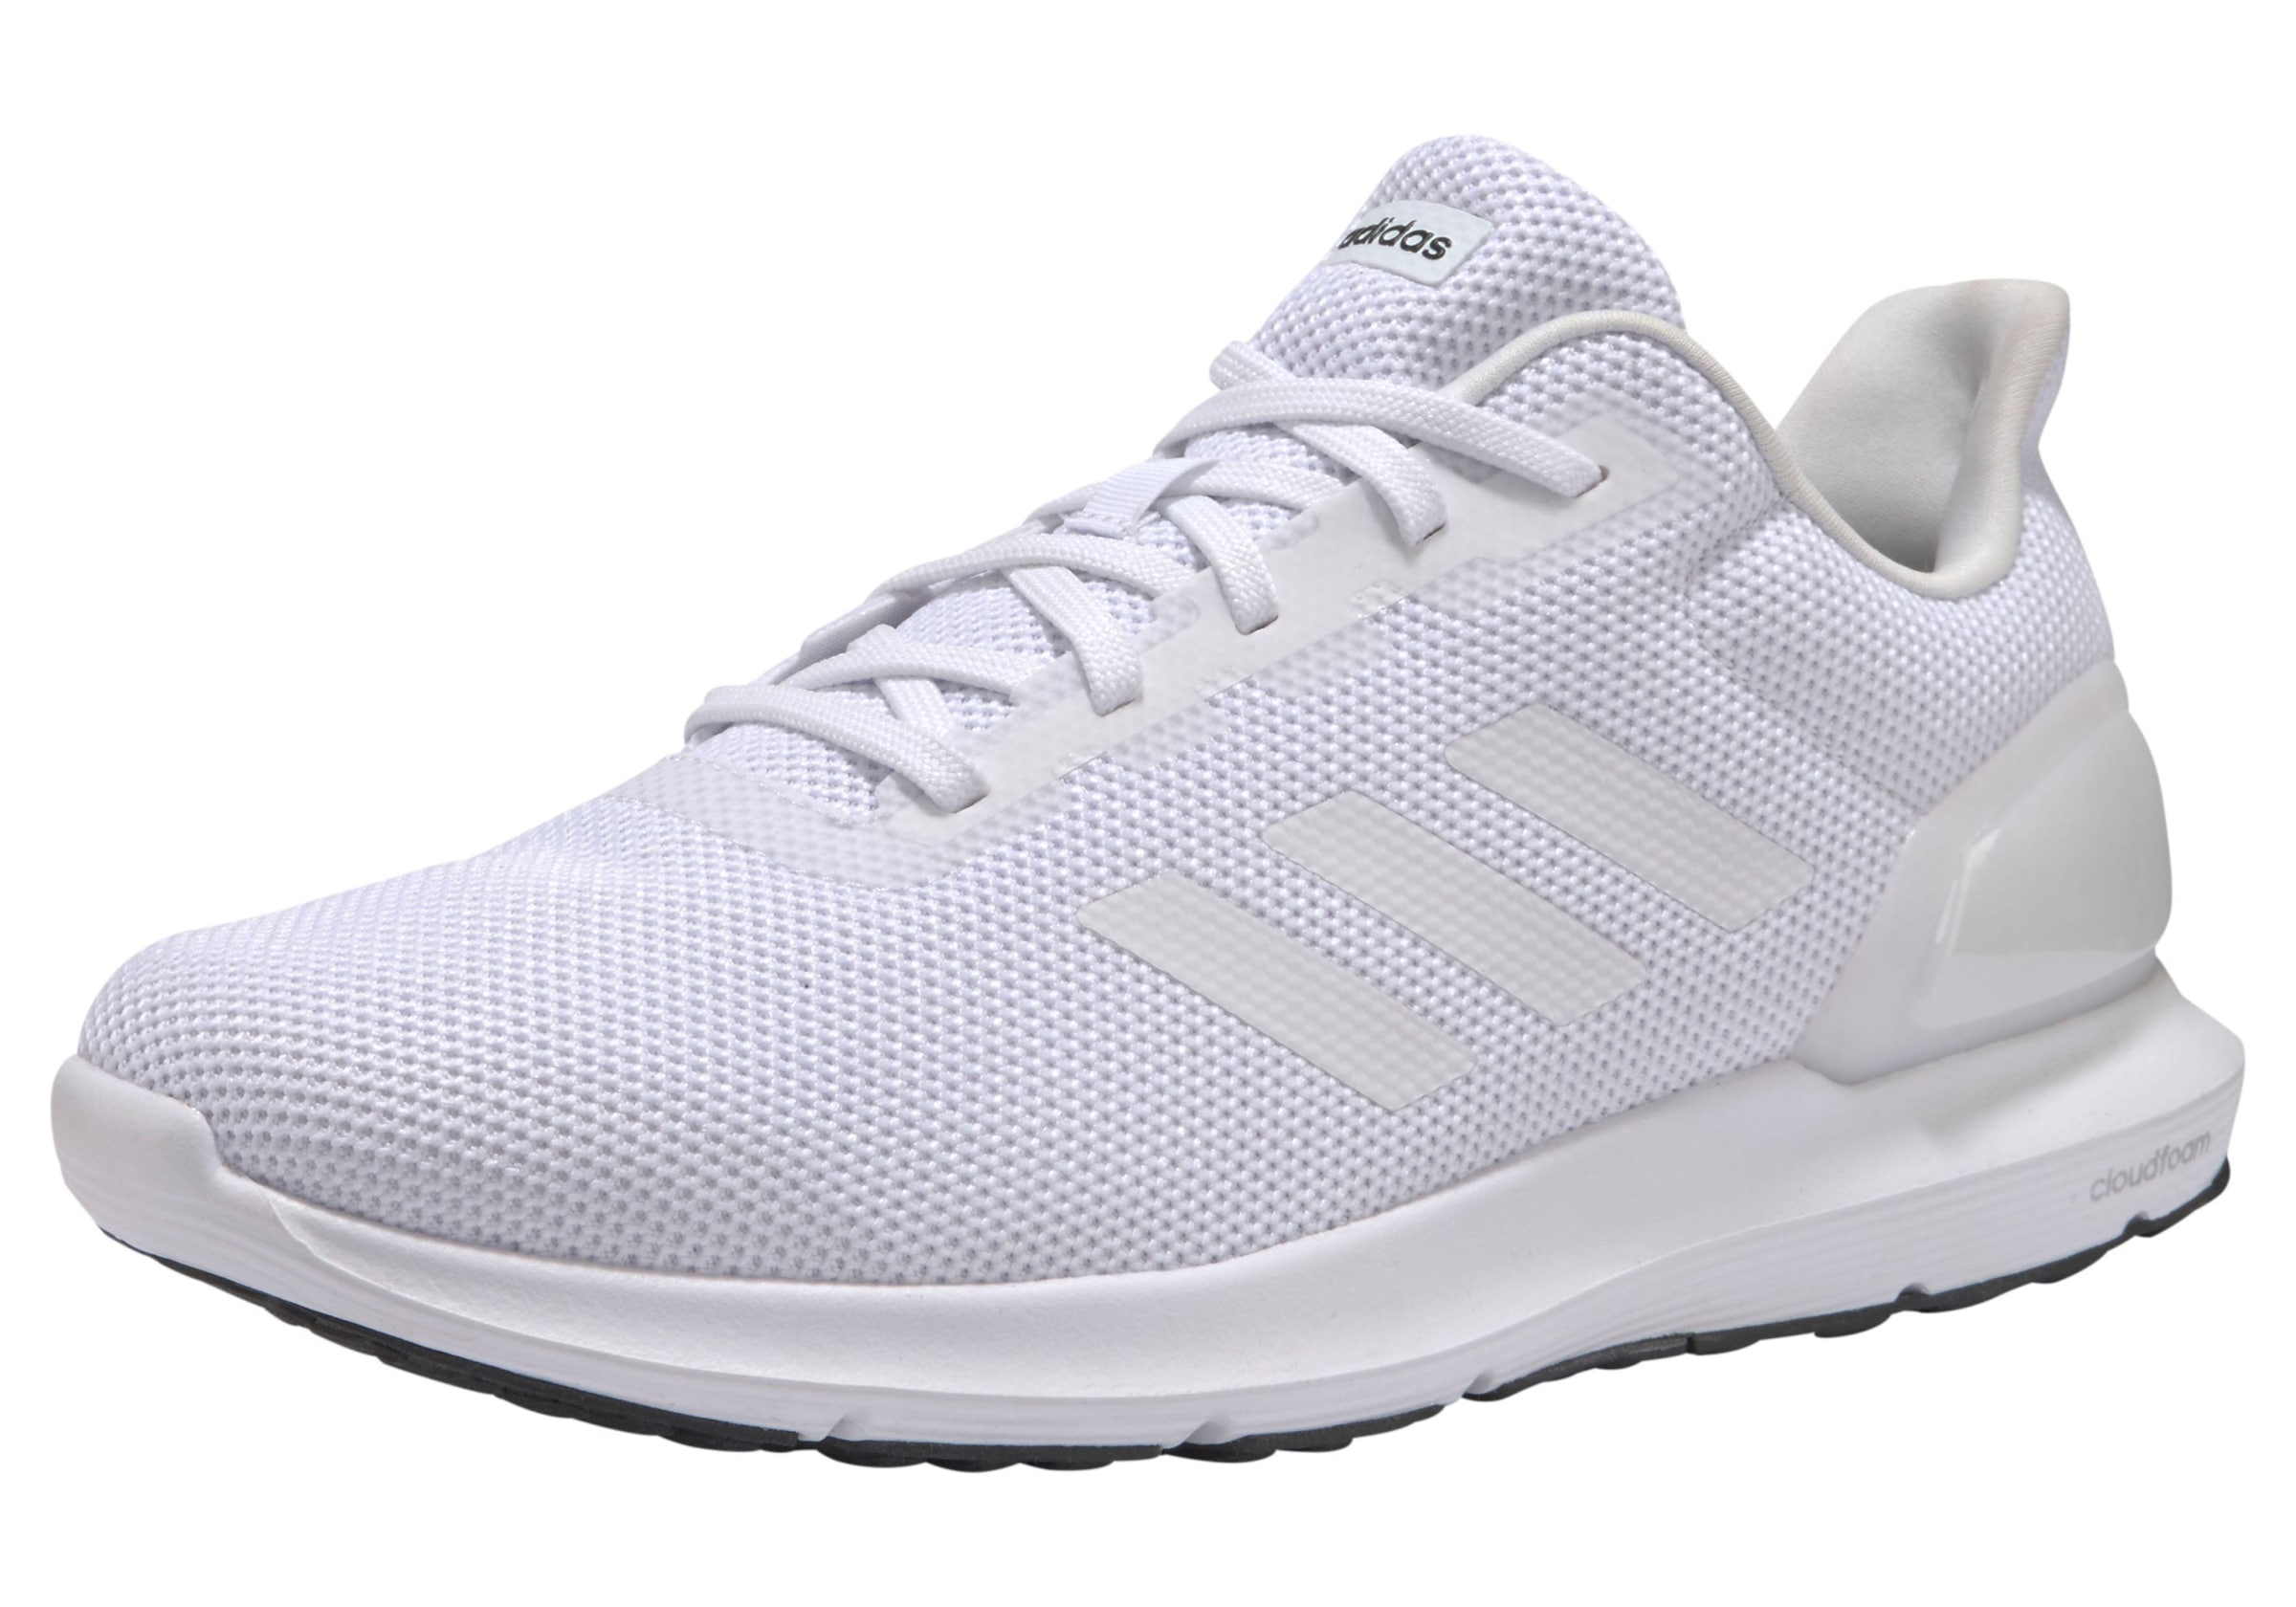 adidas Performance Galaxy Elite 2 M Schuhe Herren Laufschuhe